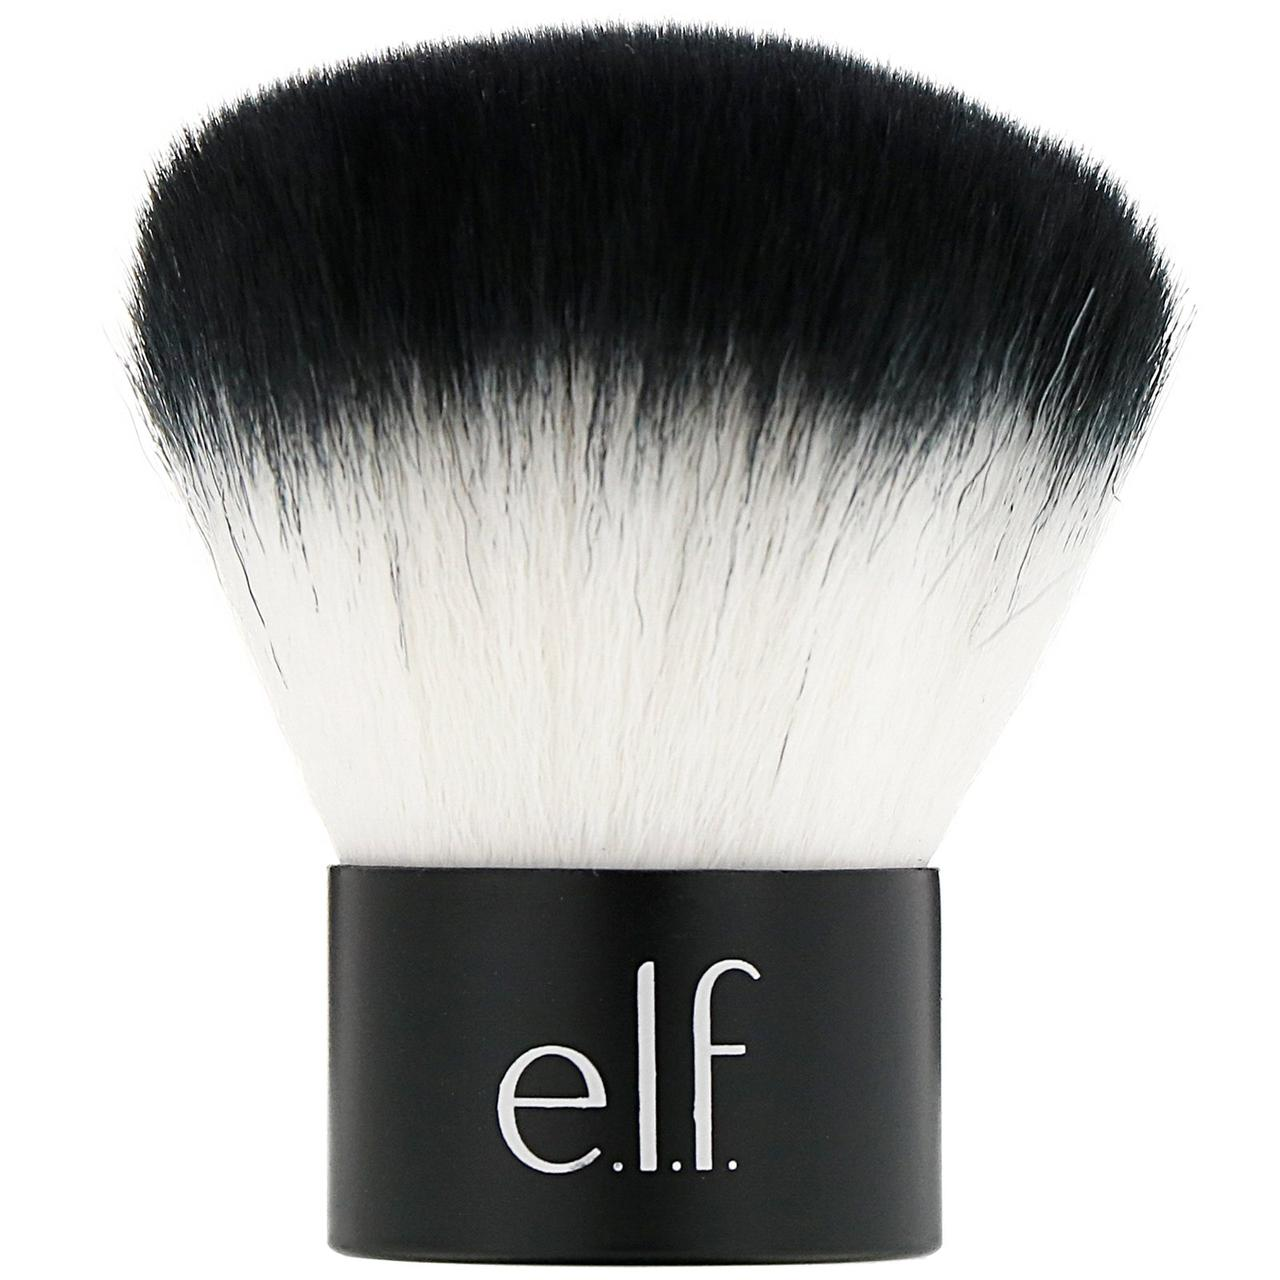 Кисти для лица (кабуки) E.L.F. Cosmetics, 1 шт.